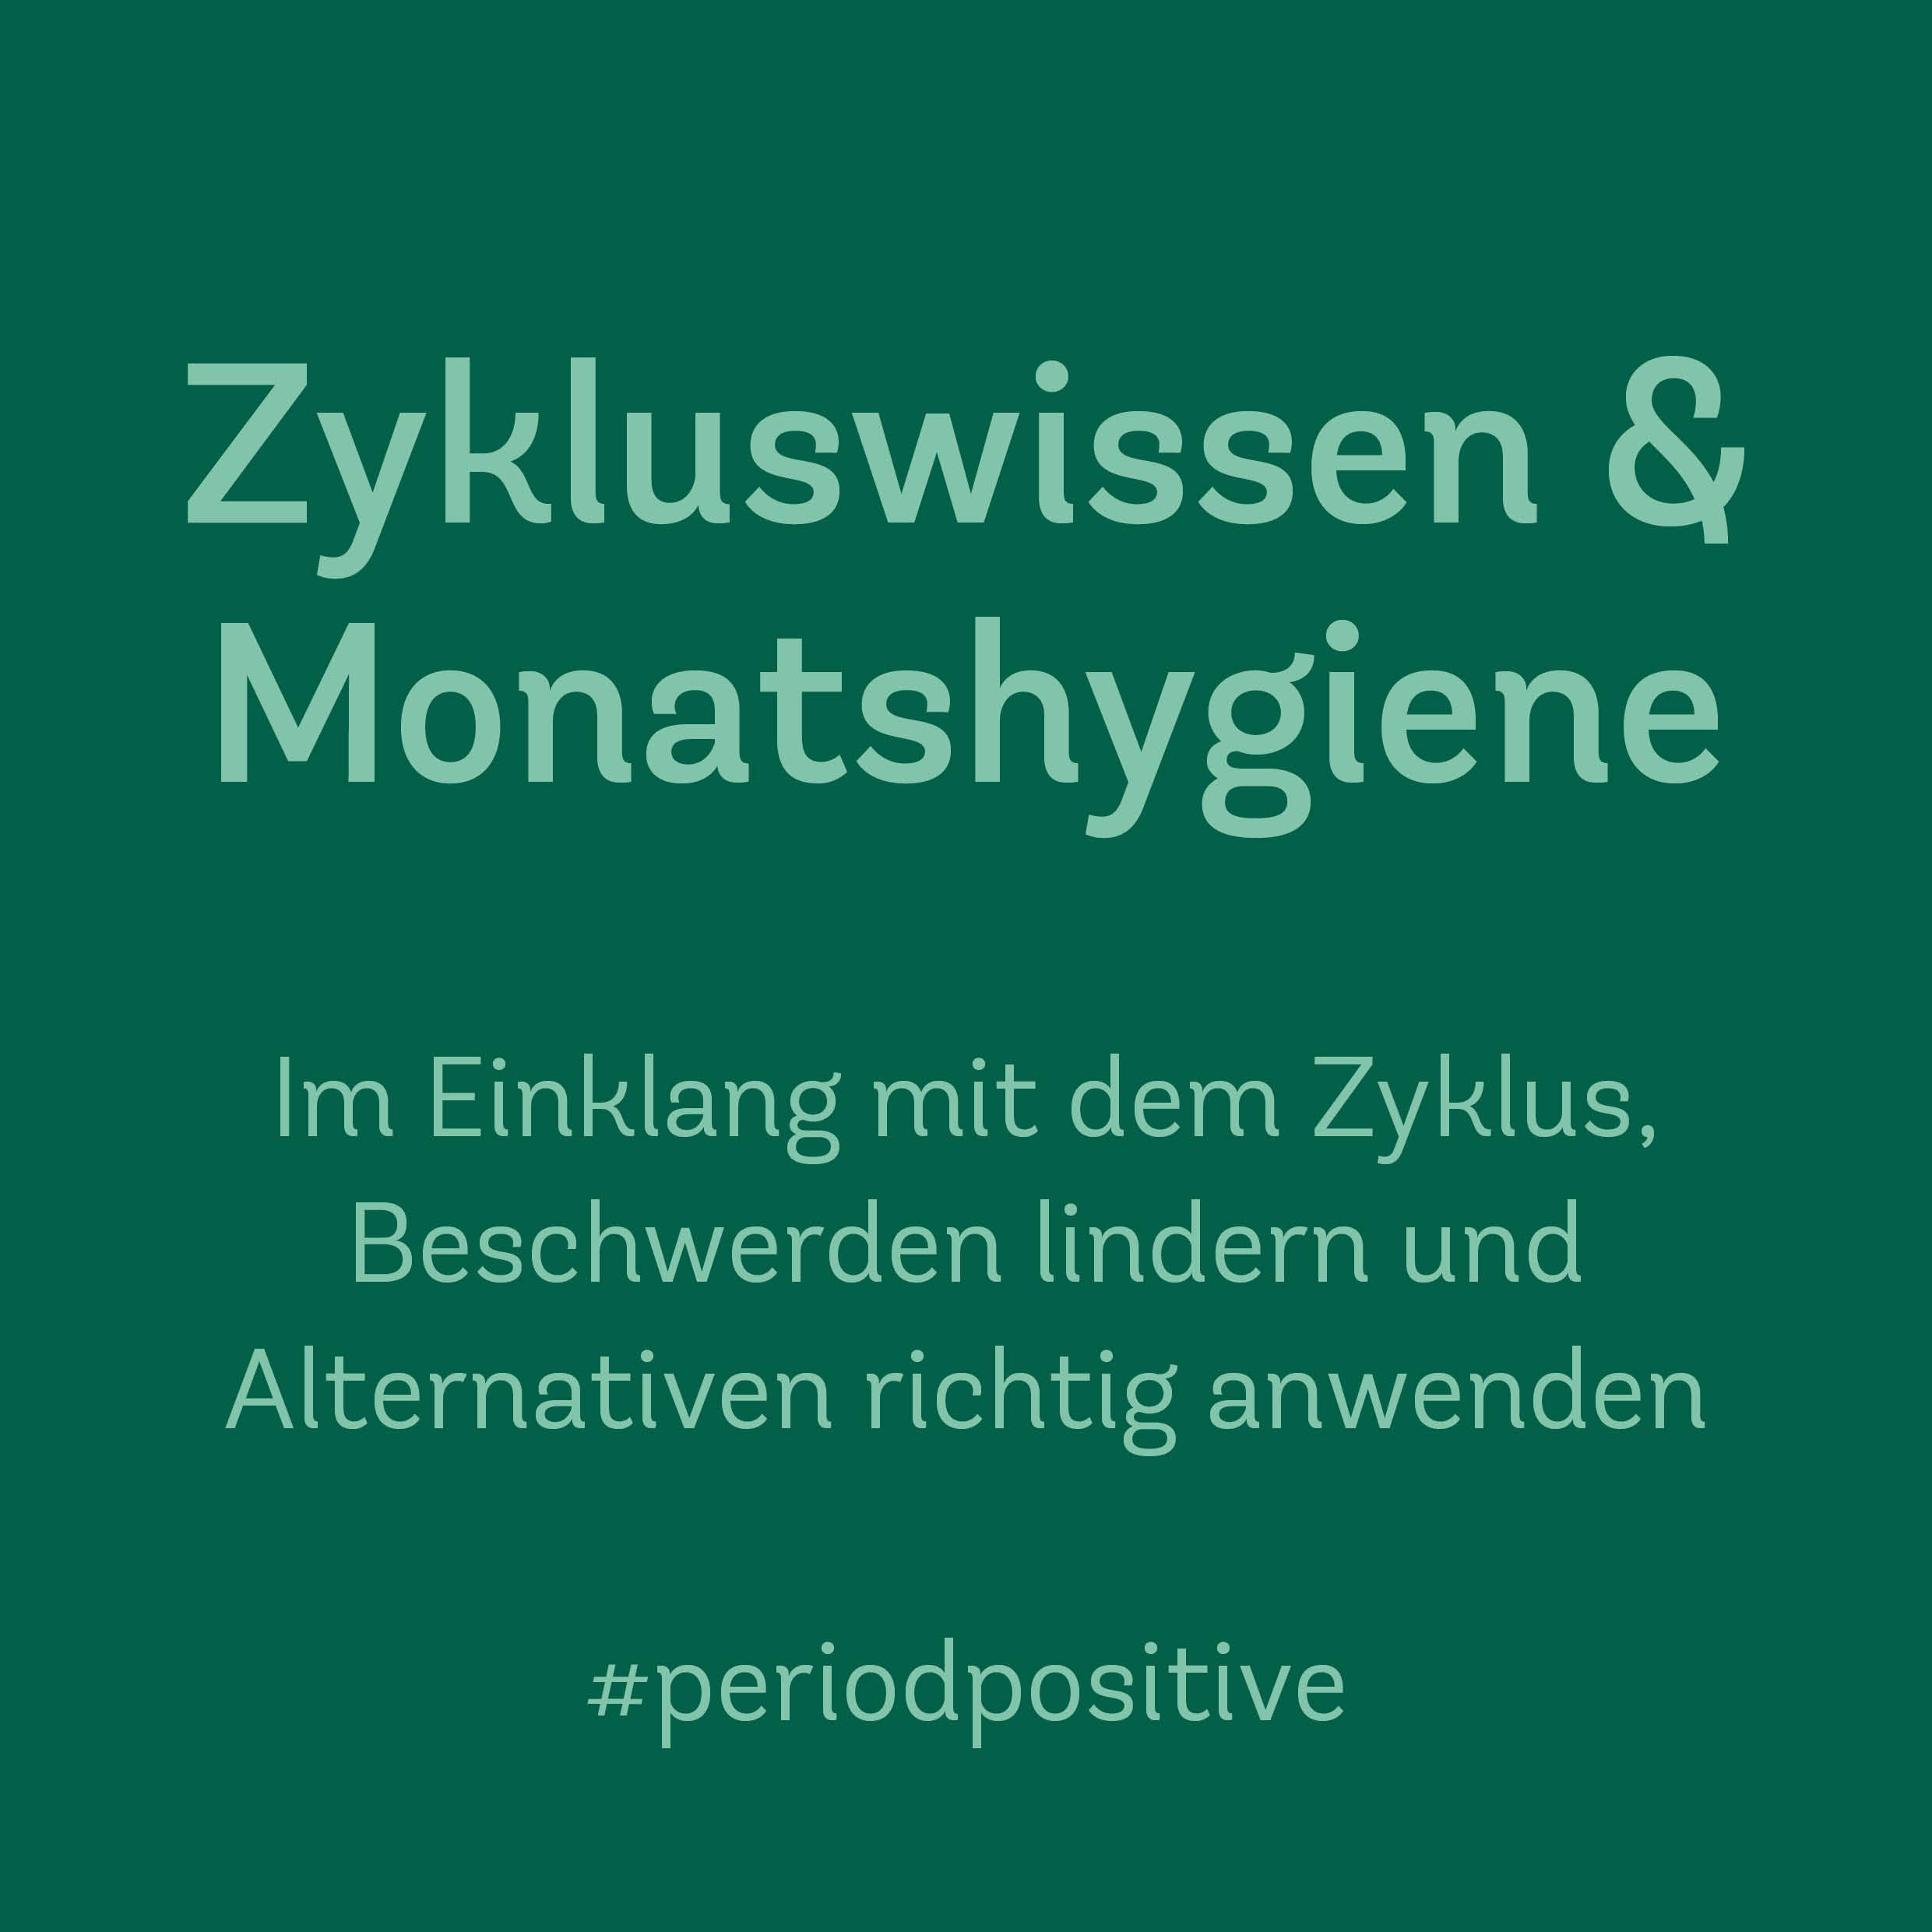 Zykluswissen & Monatshygiene – Onlinekurs